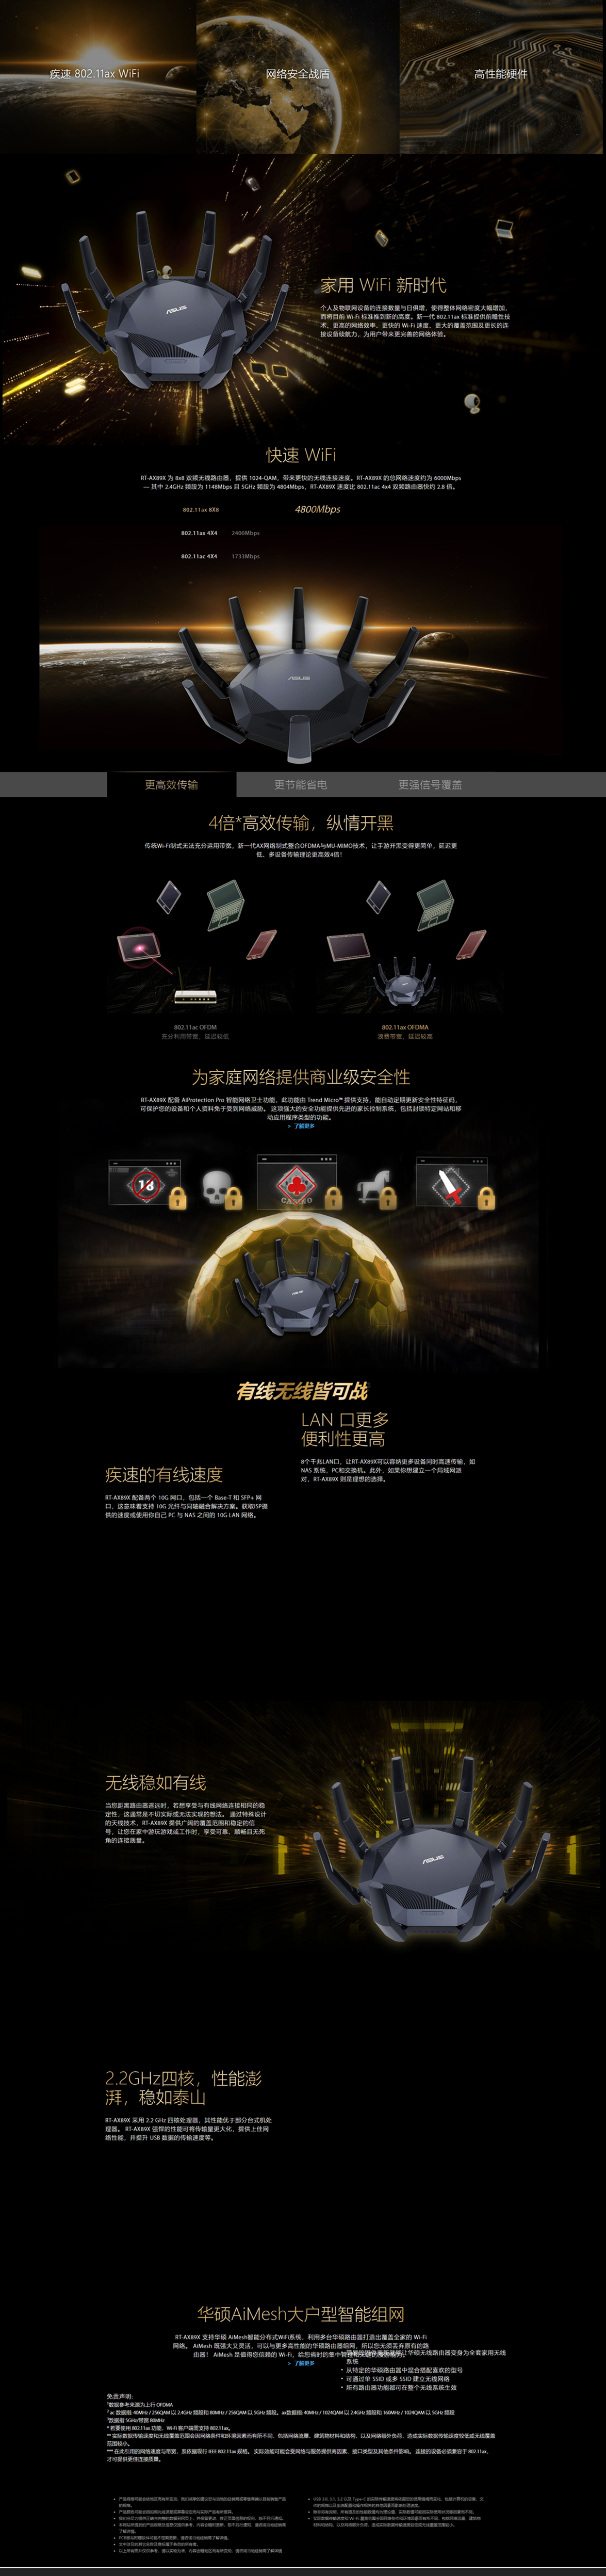 RT-AX89X   网络产品   ASUS中国_20191020220120_副本.jpg